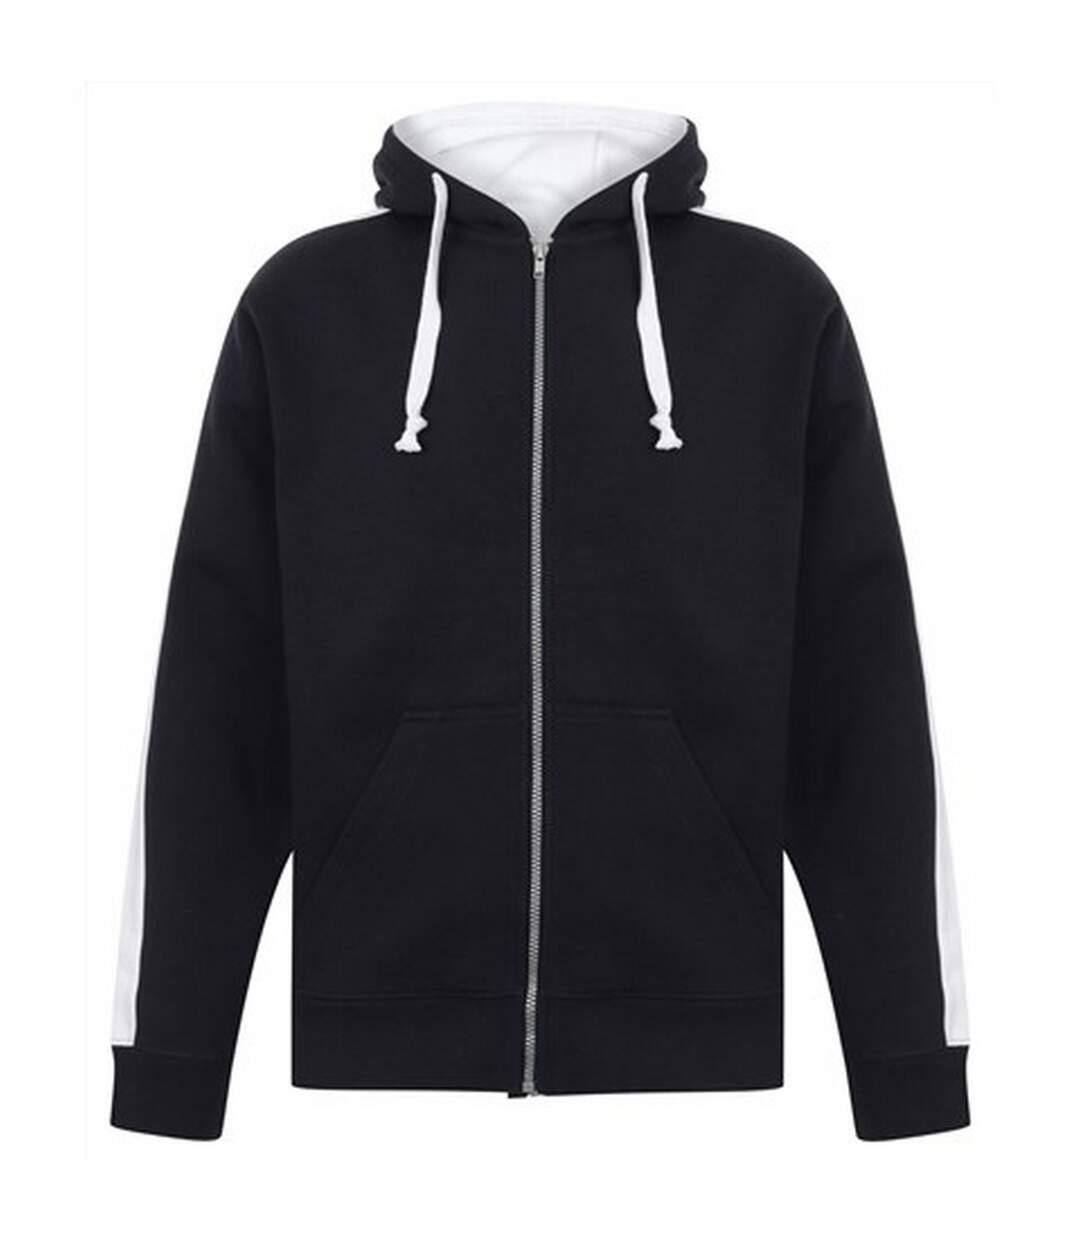 Finden & Hales Mens Full Zip Hooded Sweatshirt / Hoodie (Navy/White) - UTRW421